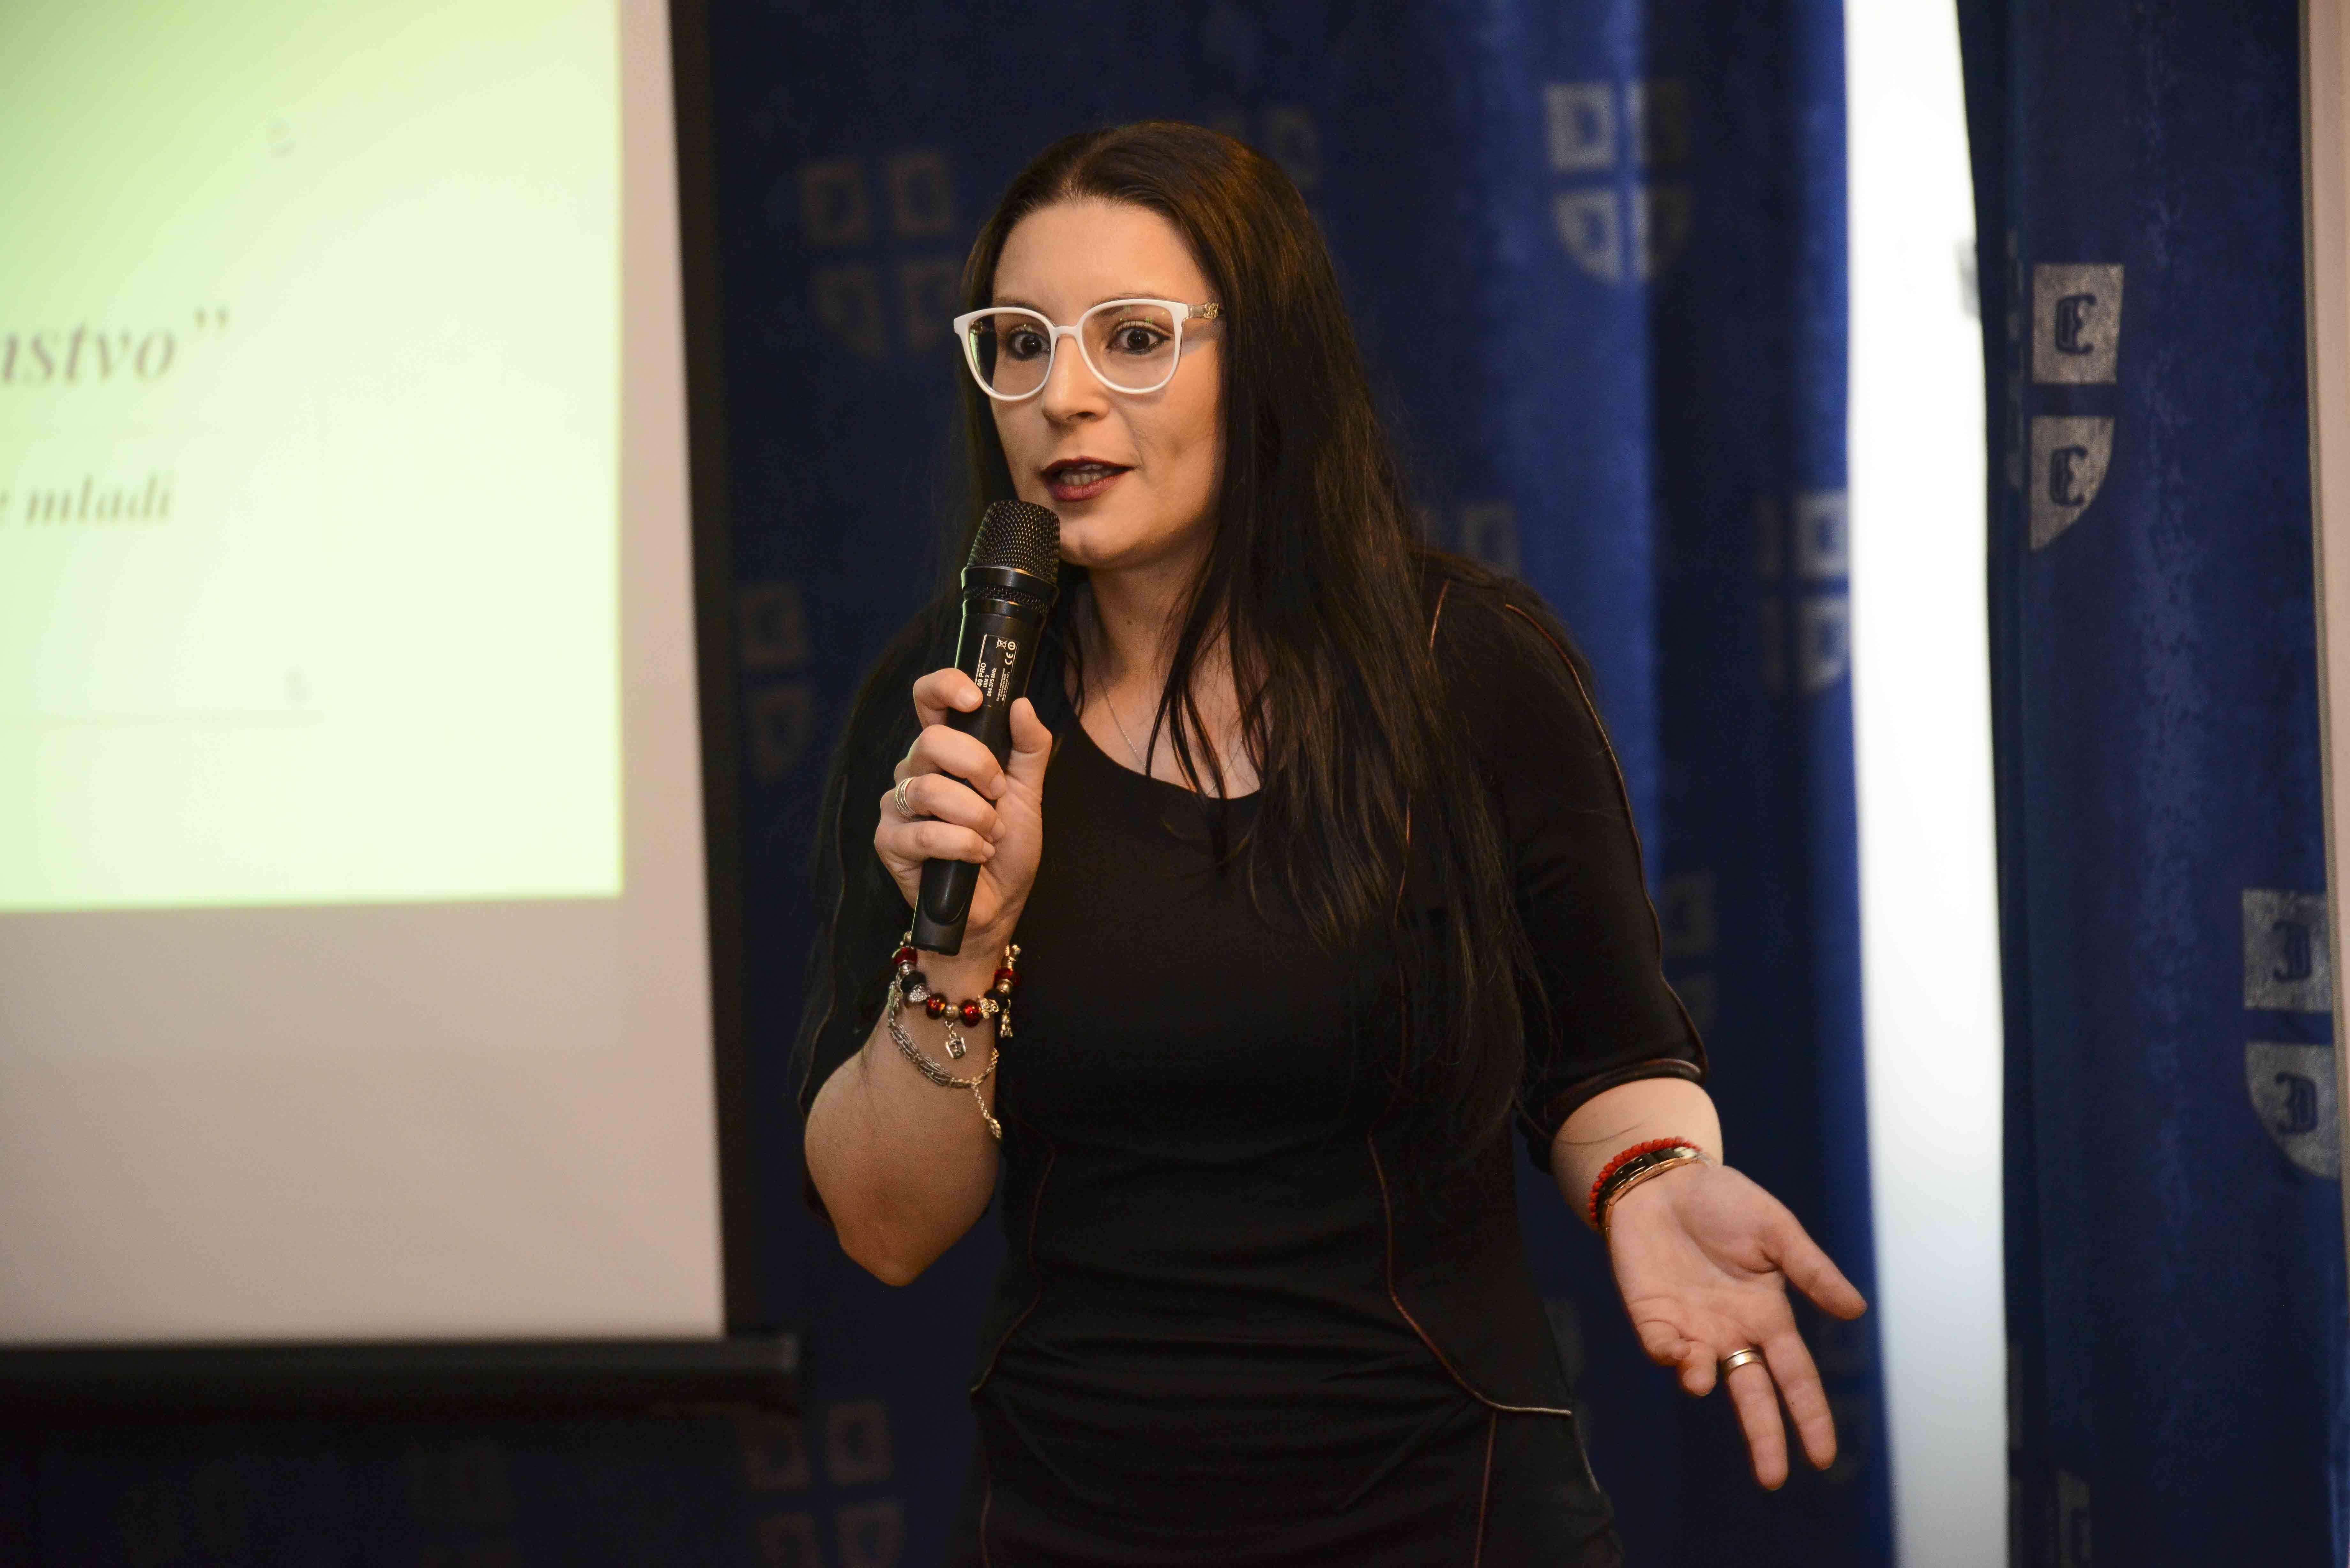 Milica Marinković